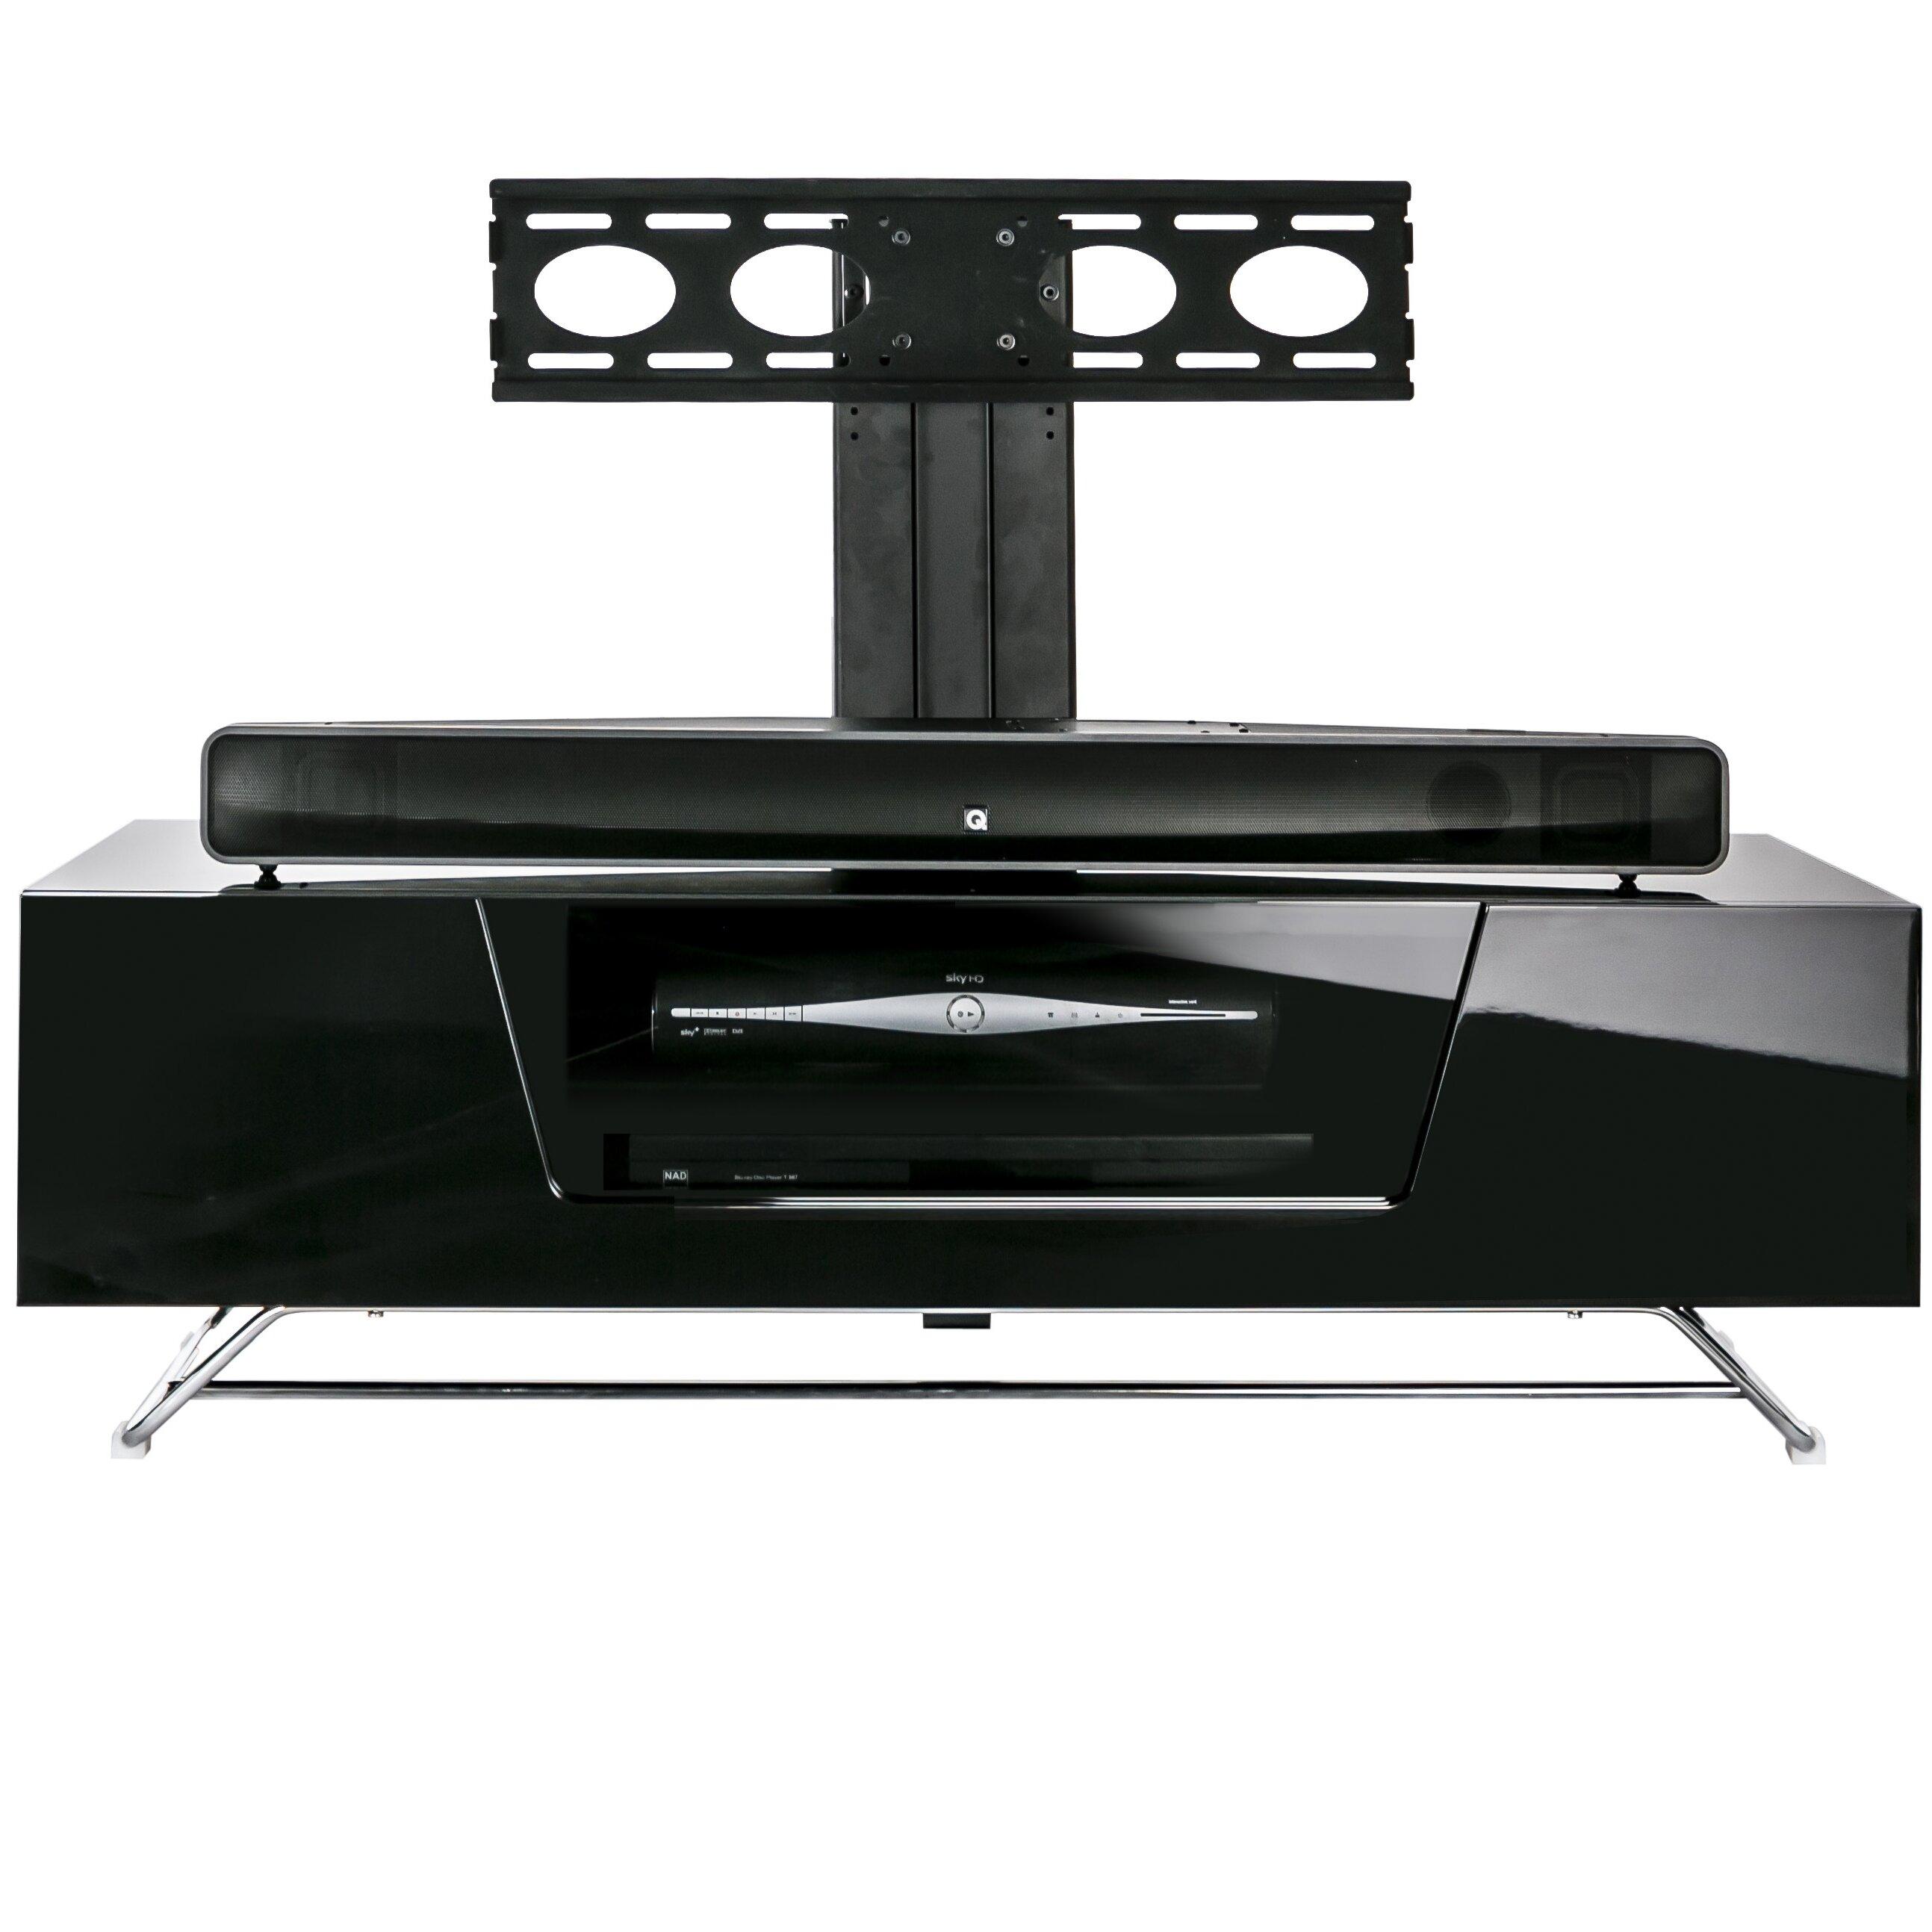 Home etc chromium tv stand for tvs up to 50 reviews for Furniture etc reviews